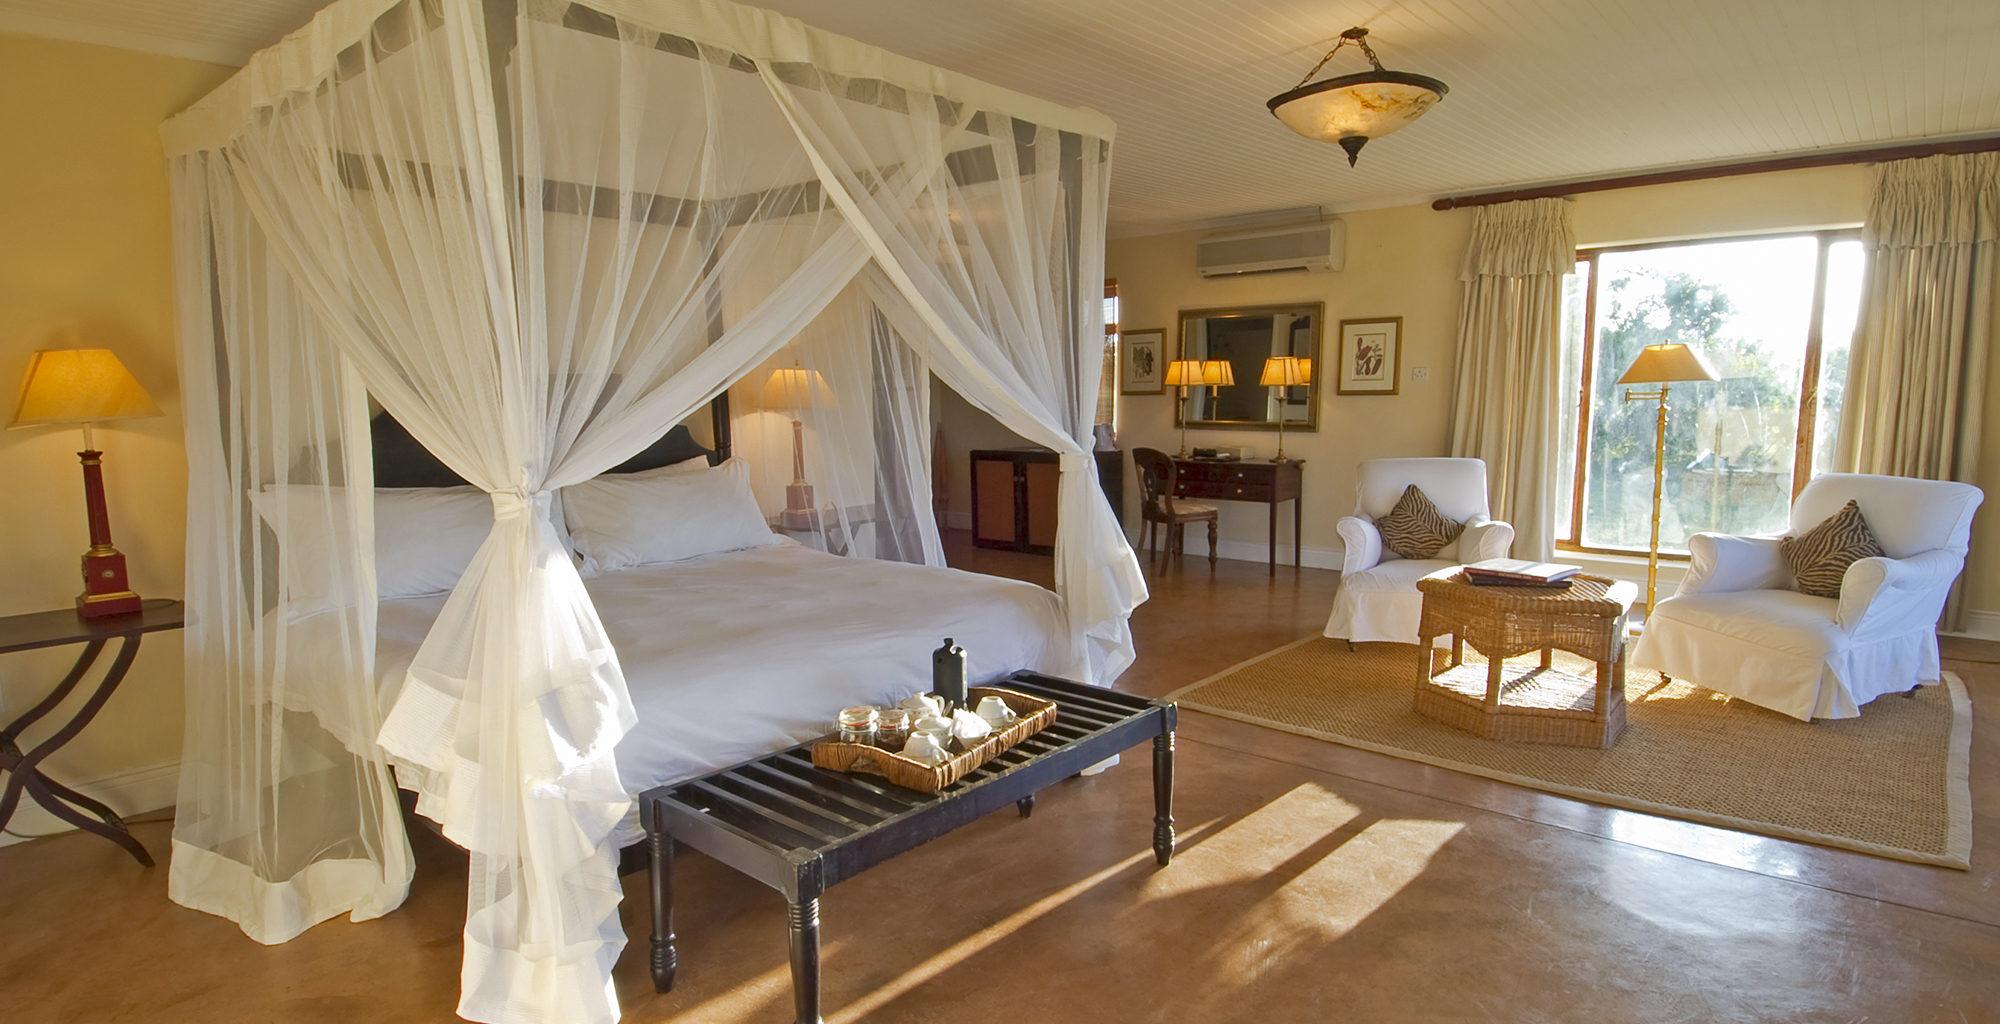 Zambia-Chichele-Presidential-Bedroom